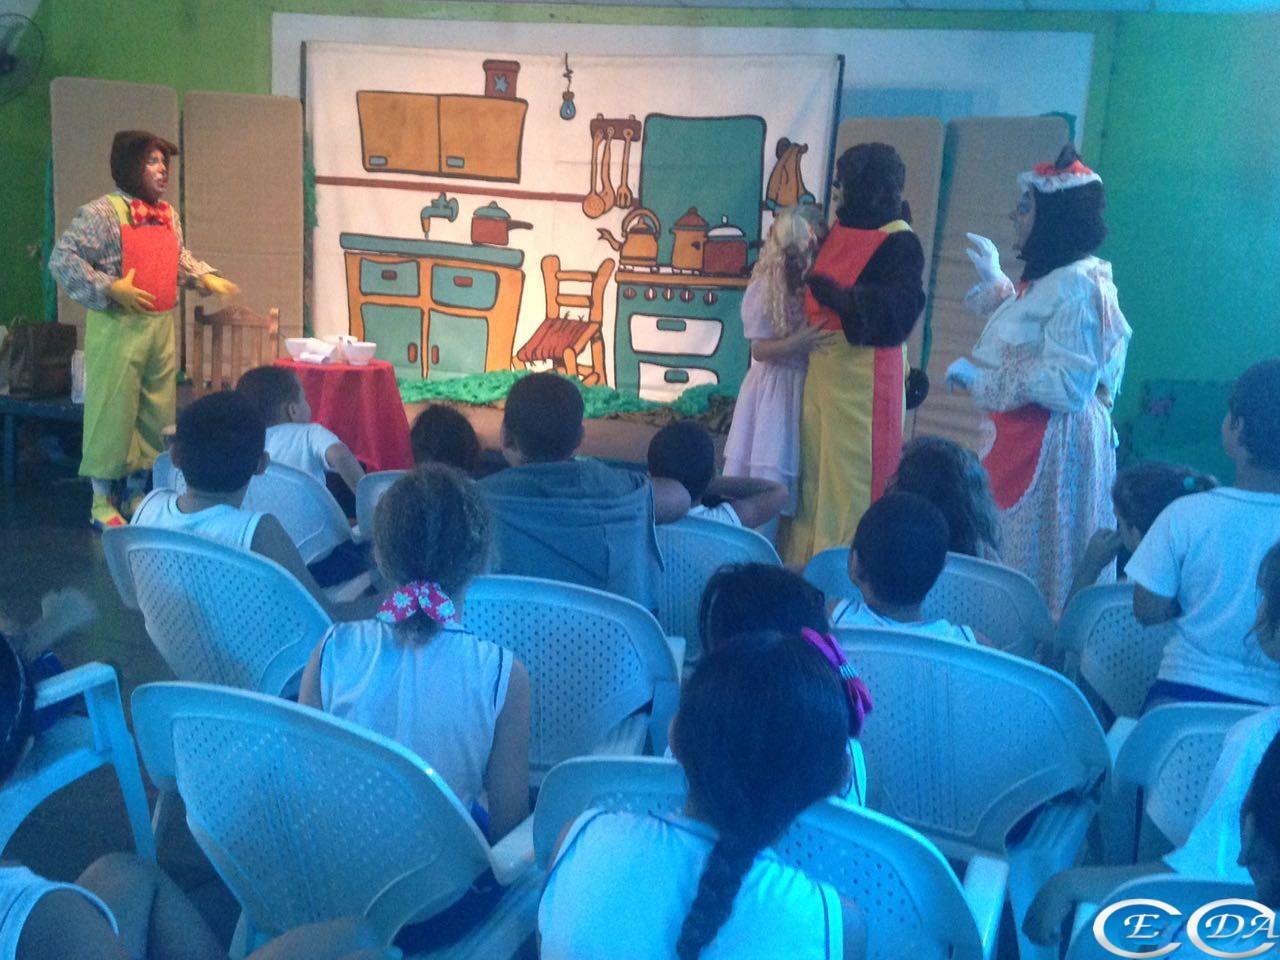 Teatro na Escola 2016 (16)